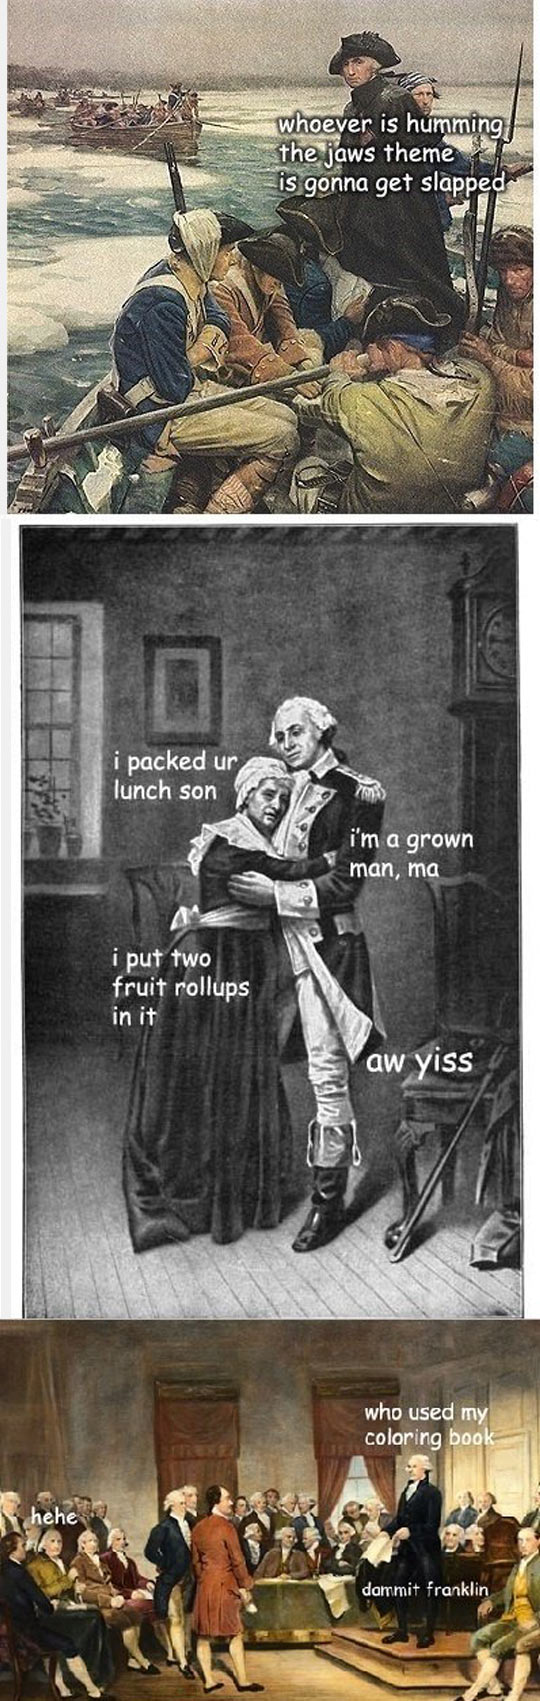 cool-fathers-washington-captions